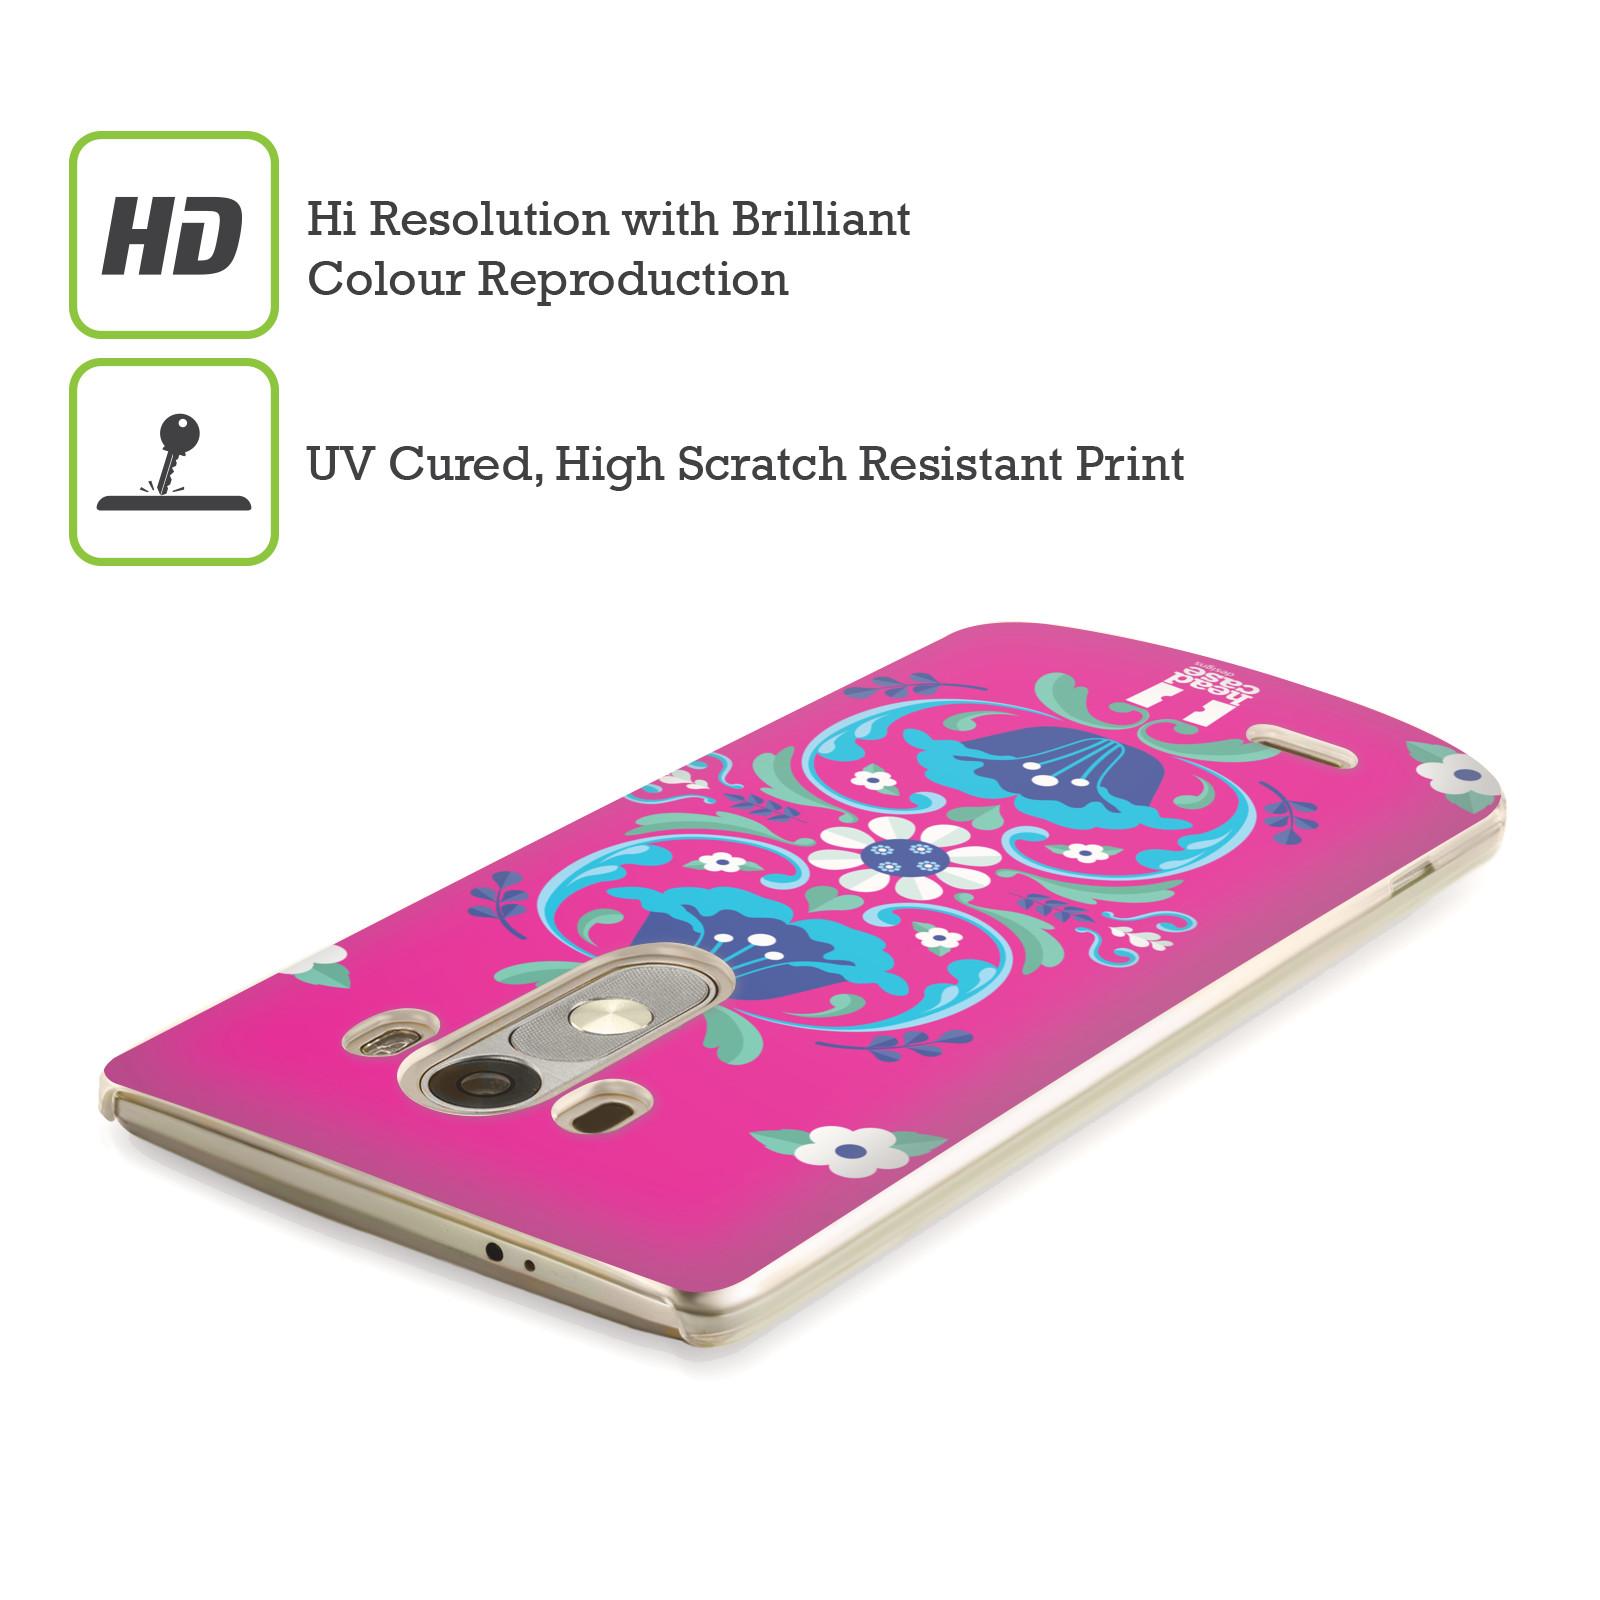 HEAD-CASE-DESIGNS-NORWEGIAN-ROSEMALING-HARD-BACK-CASE-FOR-LG-PHONES-1